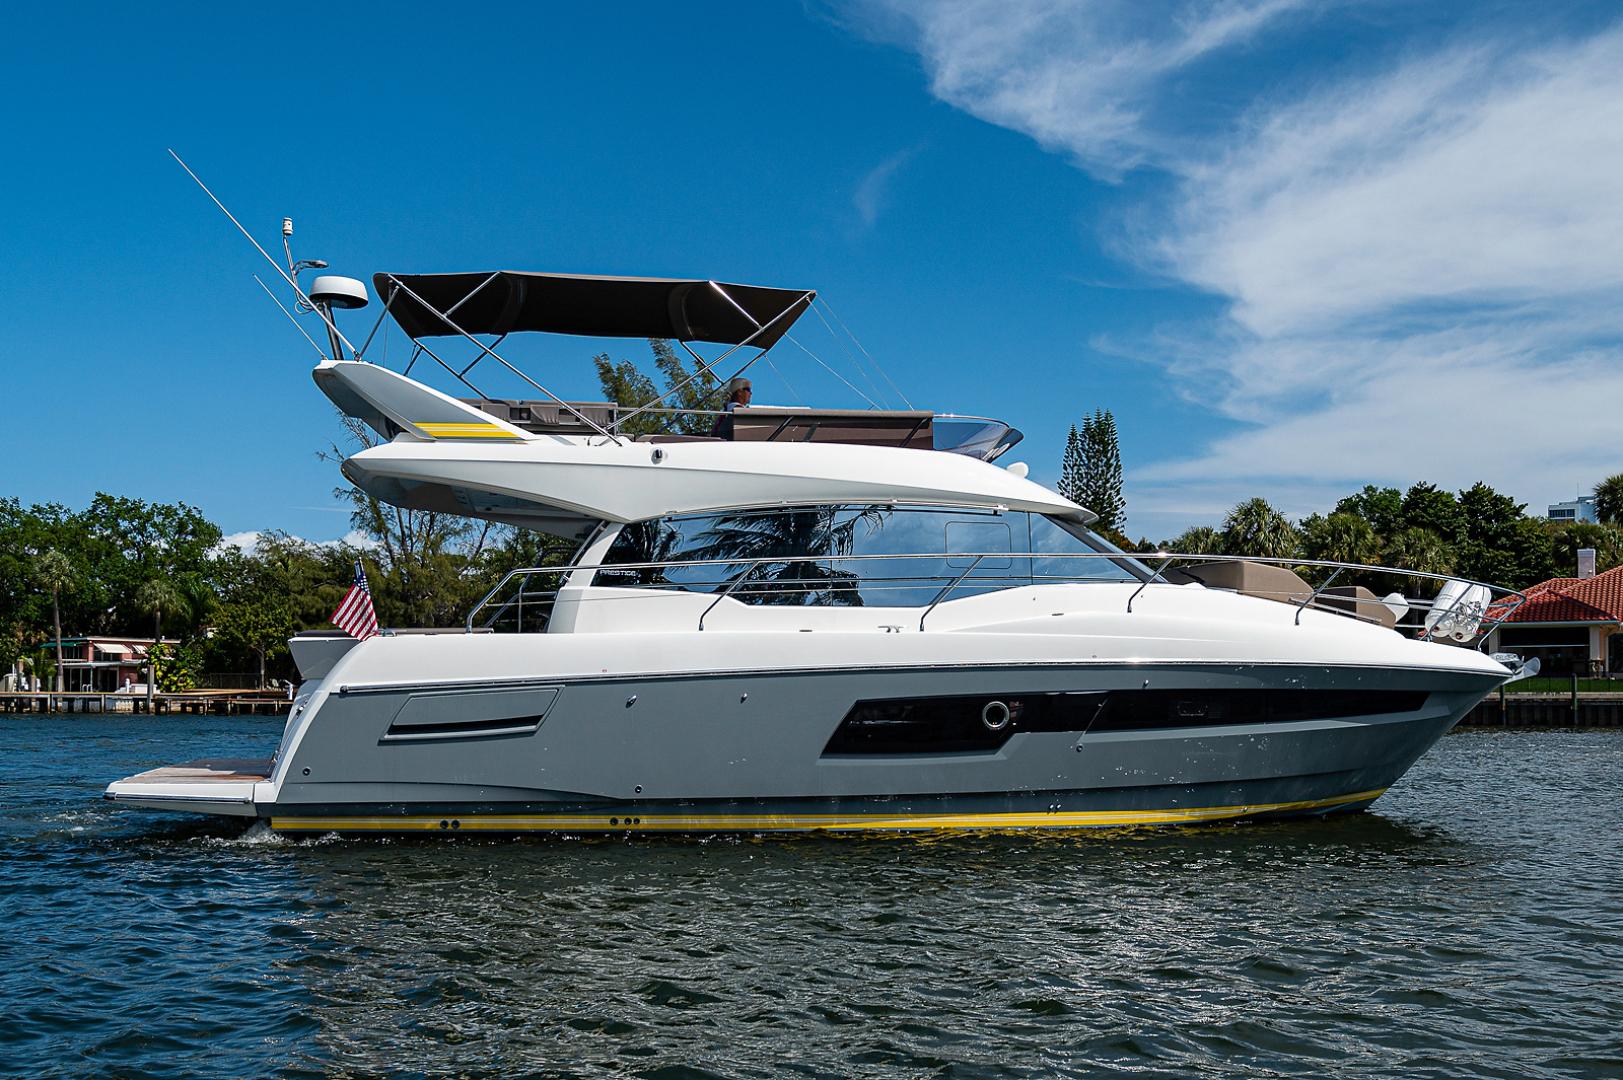 Prestige-460 Flybridge 2018-SEAQUEL Palm Beach Gardens-Florida-United States-Starboard Side-1351130 | Thumbnail